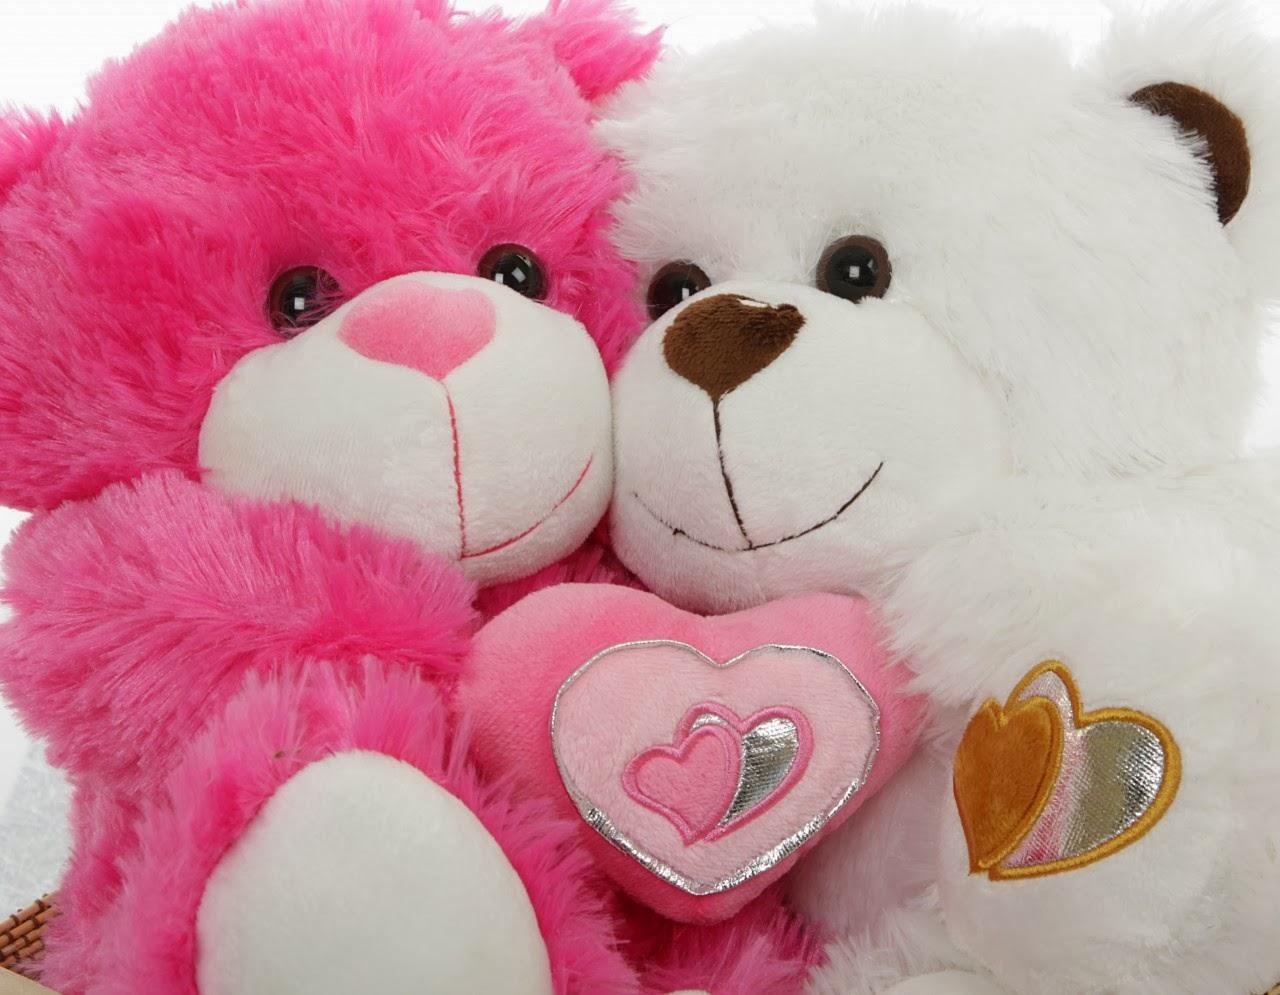 Teddy bear day gifts in Jodhpur